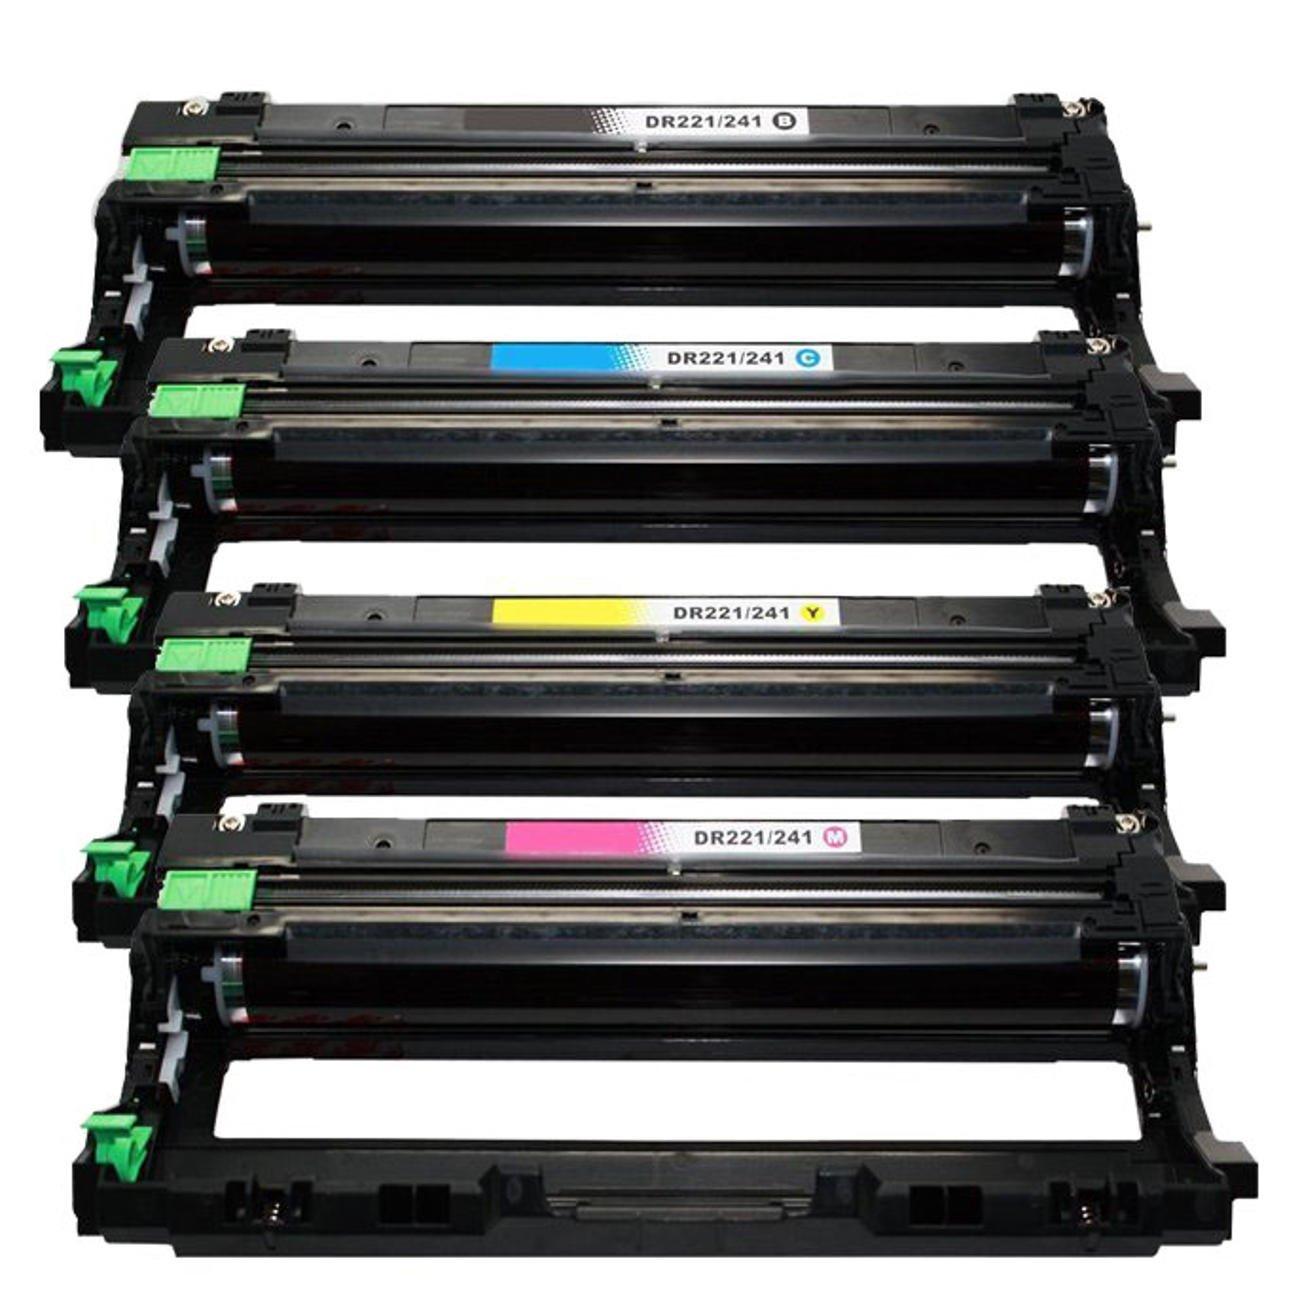 1 Set of 4 Save on Many Compatible DR-221CL DR221CL DR221 BK/C/M/Y - Black Cyan Magenta Yellow Drum Unit Set for Brother DCP-9020CDN HL-3140CW HL-3150CDN HL-3170CDW HL-3180CDW MFC-9130CW MFC-9330CDW MFC-9340CDW Printers (uses with TN221 TN-221 TN225 TN-22